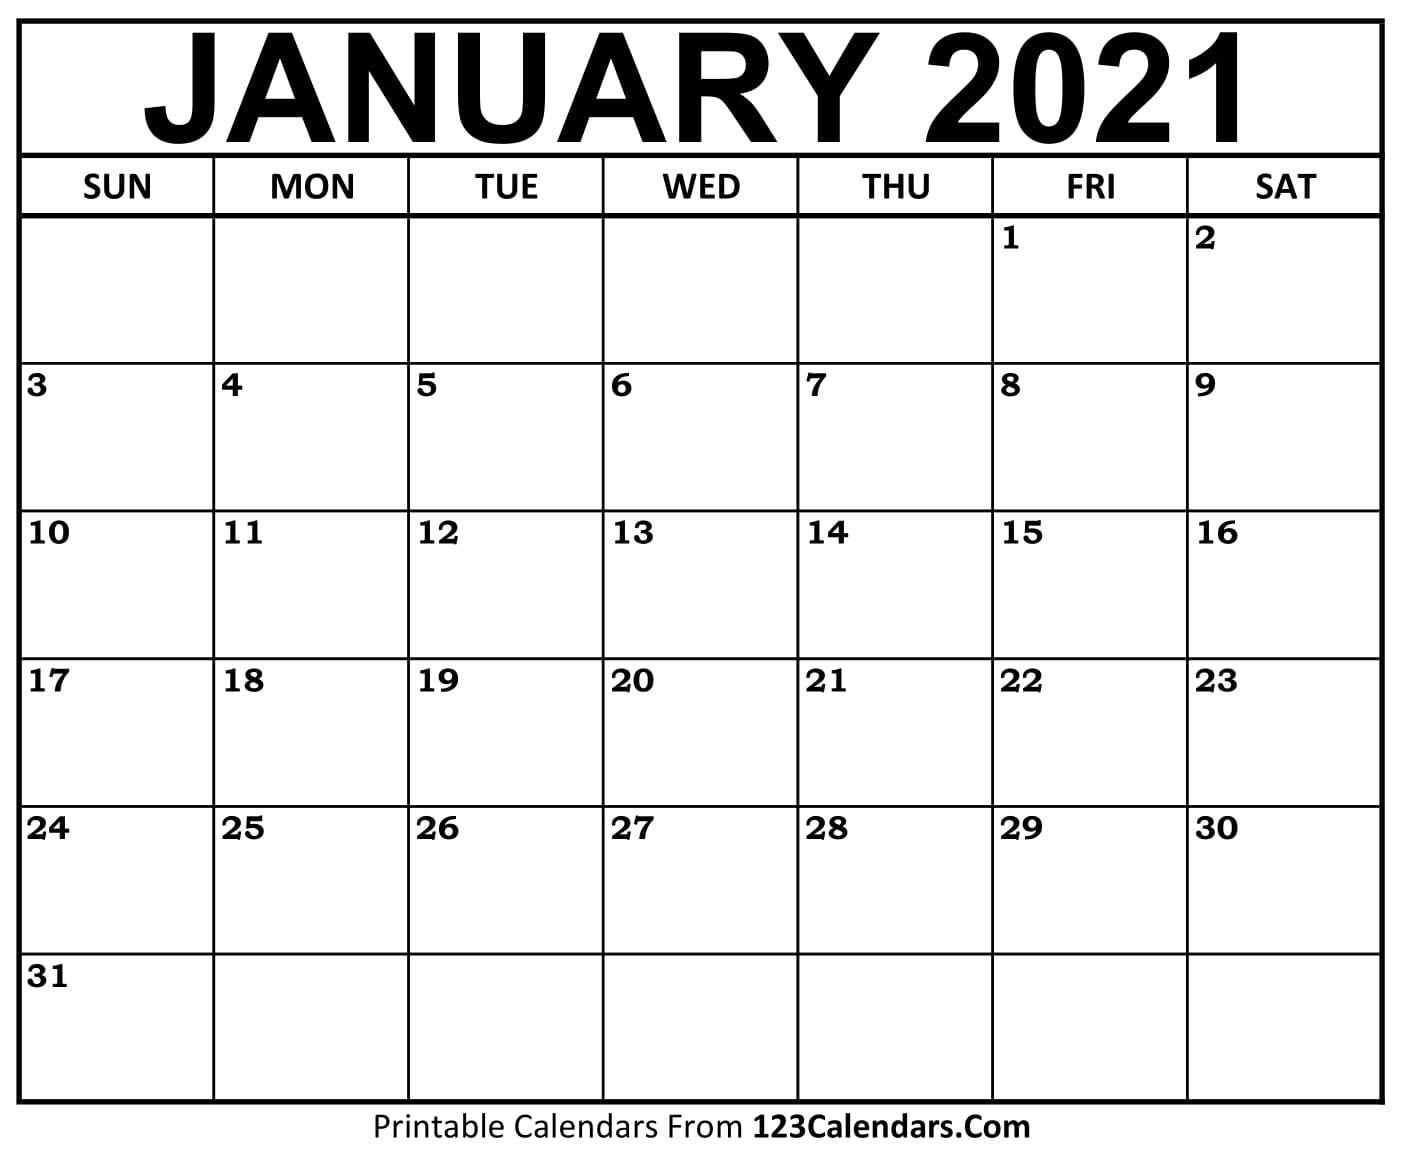 Printable January 2021 Calendar Templates | 123Calendars-Free Blank No Date Printable Calendar 2021